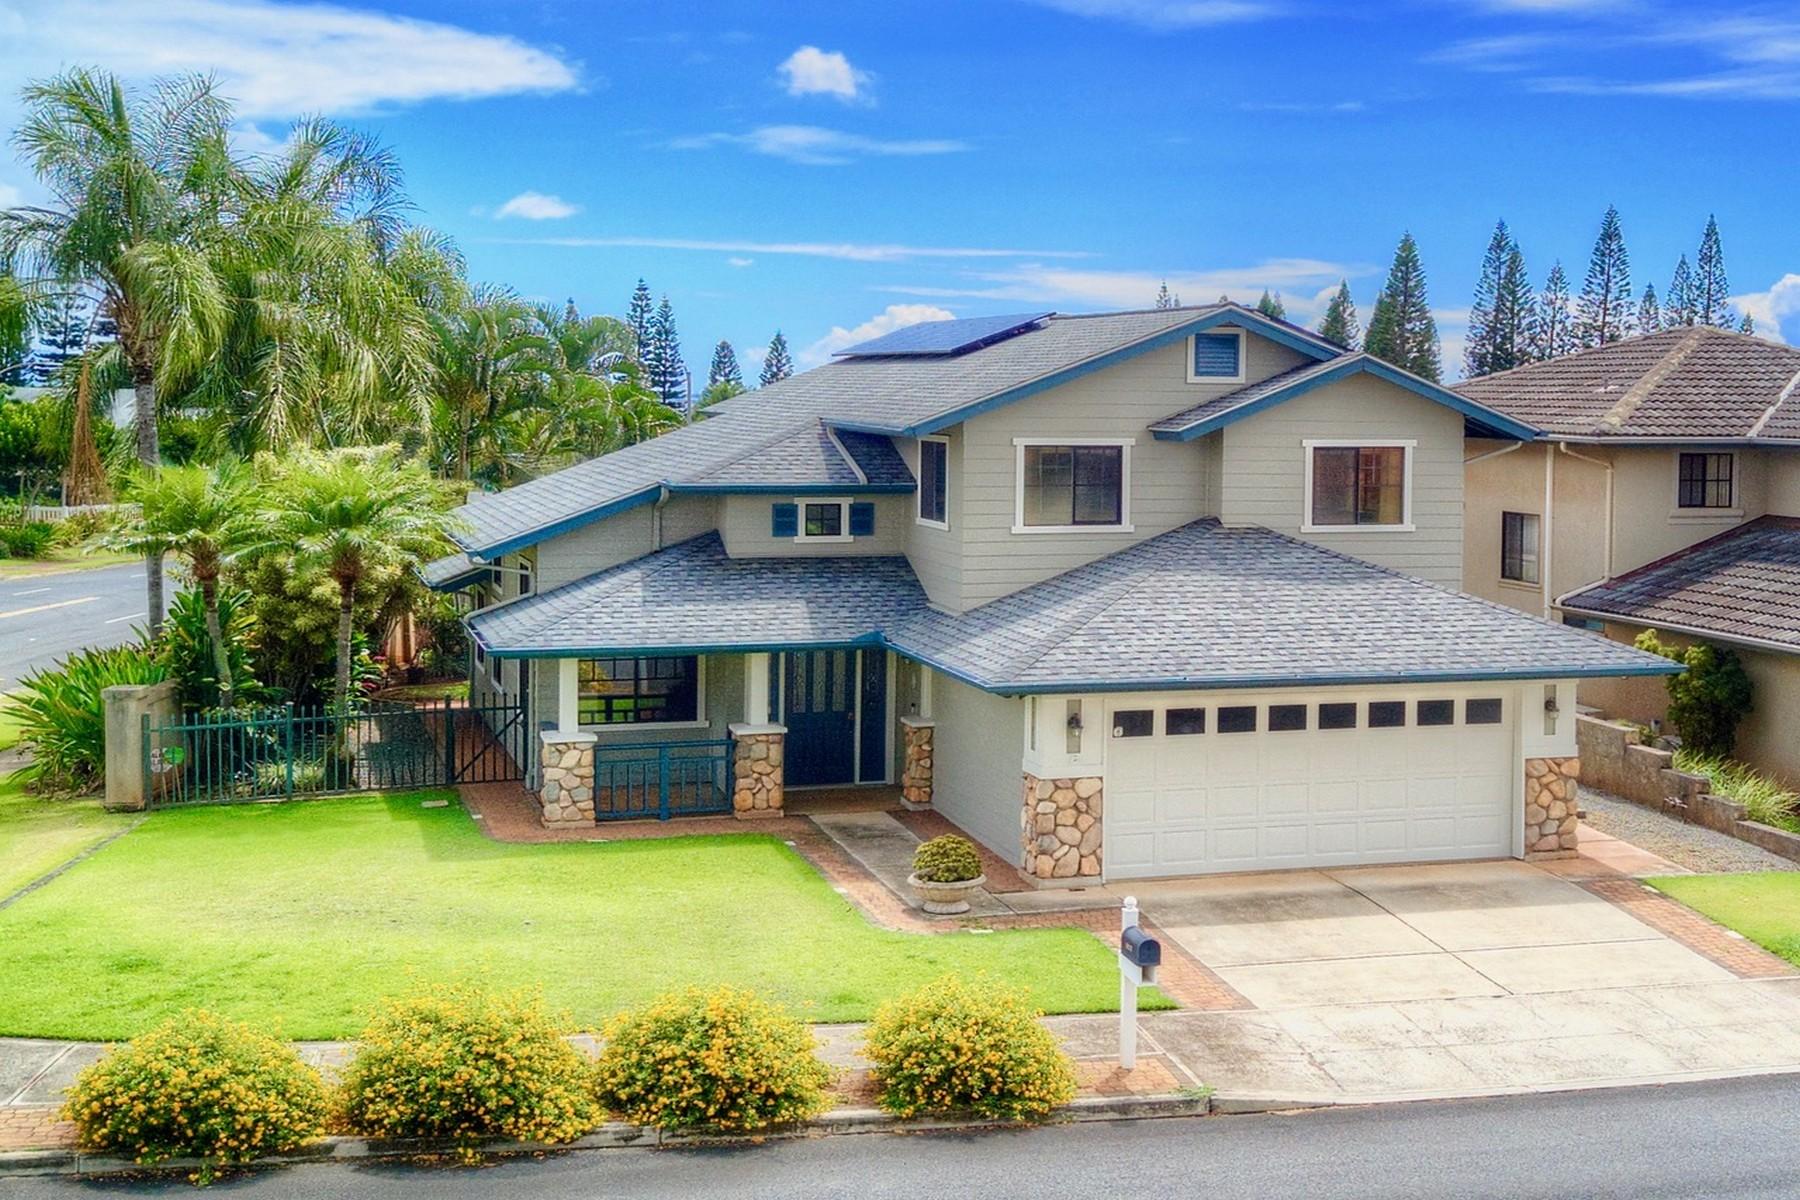 Single Family Homes för Försäljning vid Beautiful Waikele Home 94-237 Pailolo Pl, Waipahu, Hawaii 96797 Förenta staterna